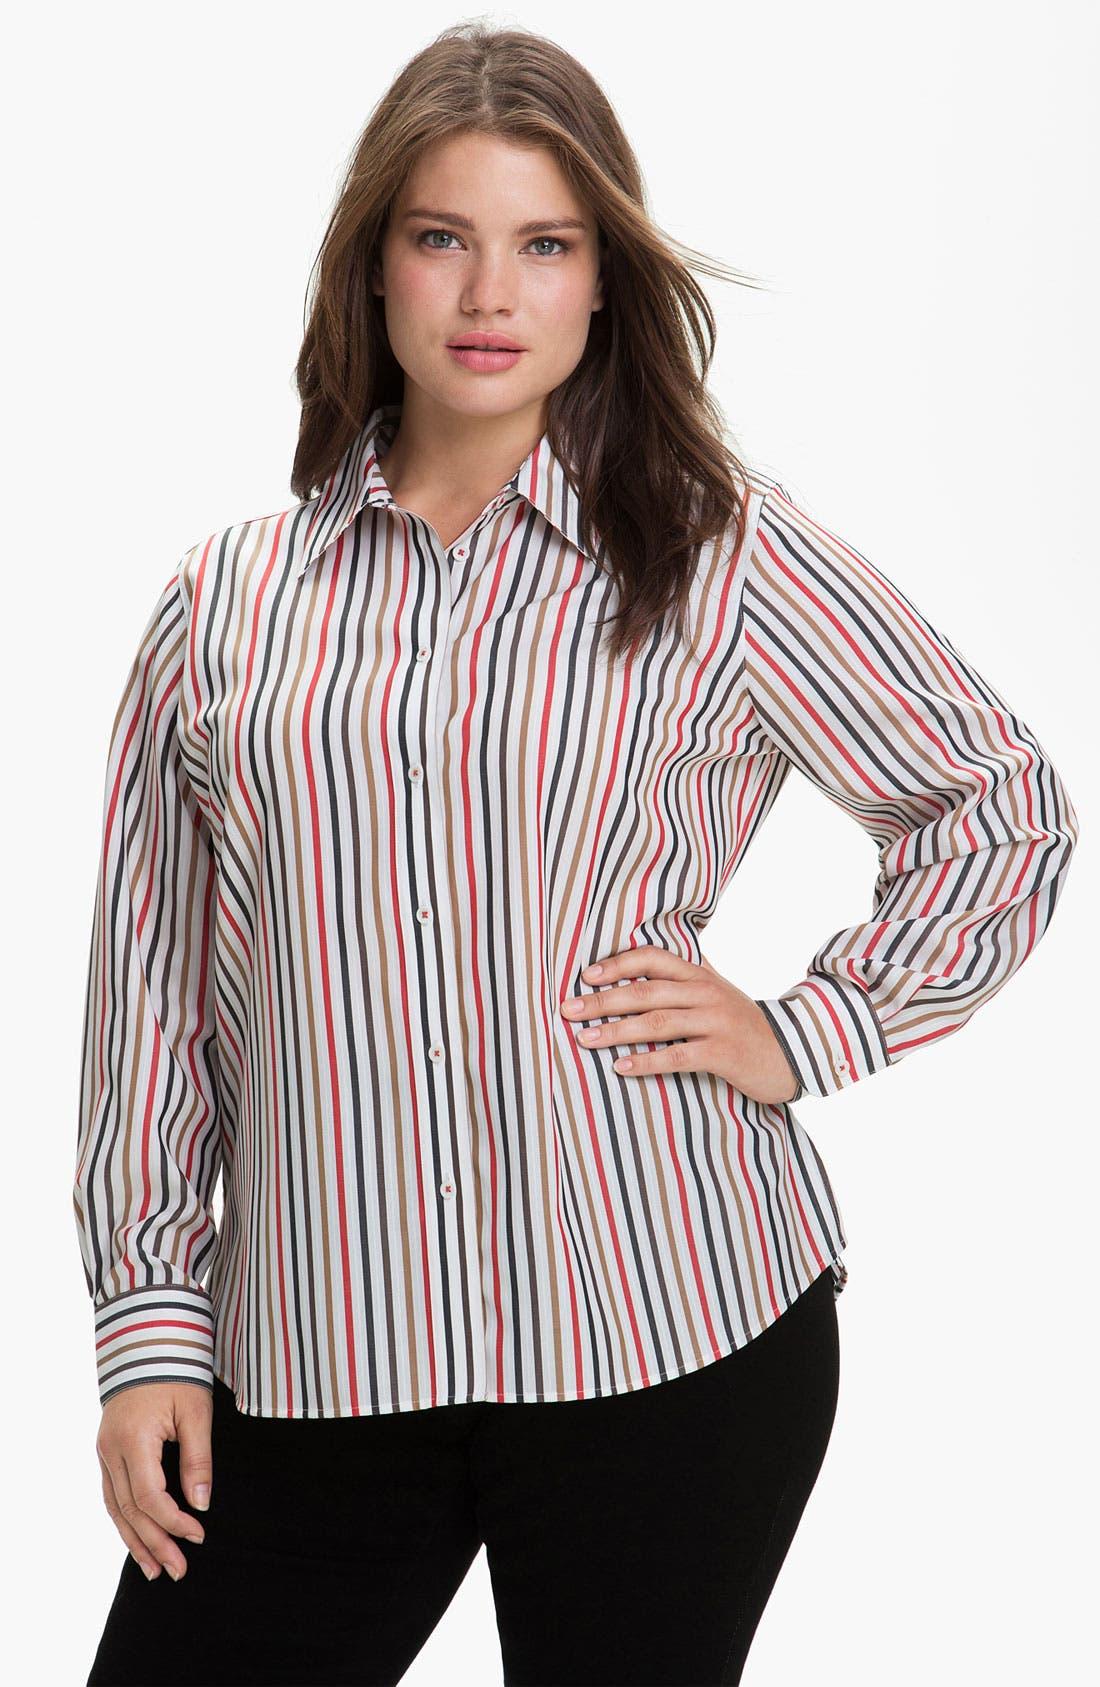 Main Image - Foxcroft 'Autumn Stripe' Wrinkle Free Shaped Shirt (Plus)